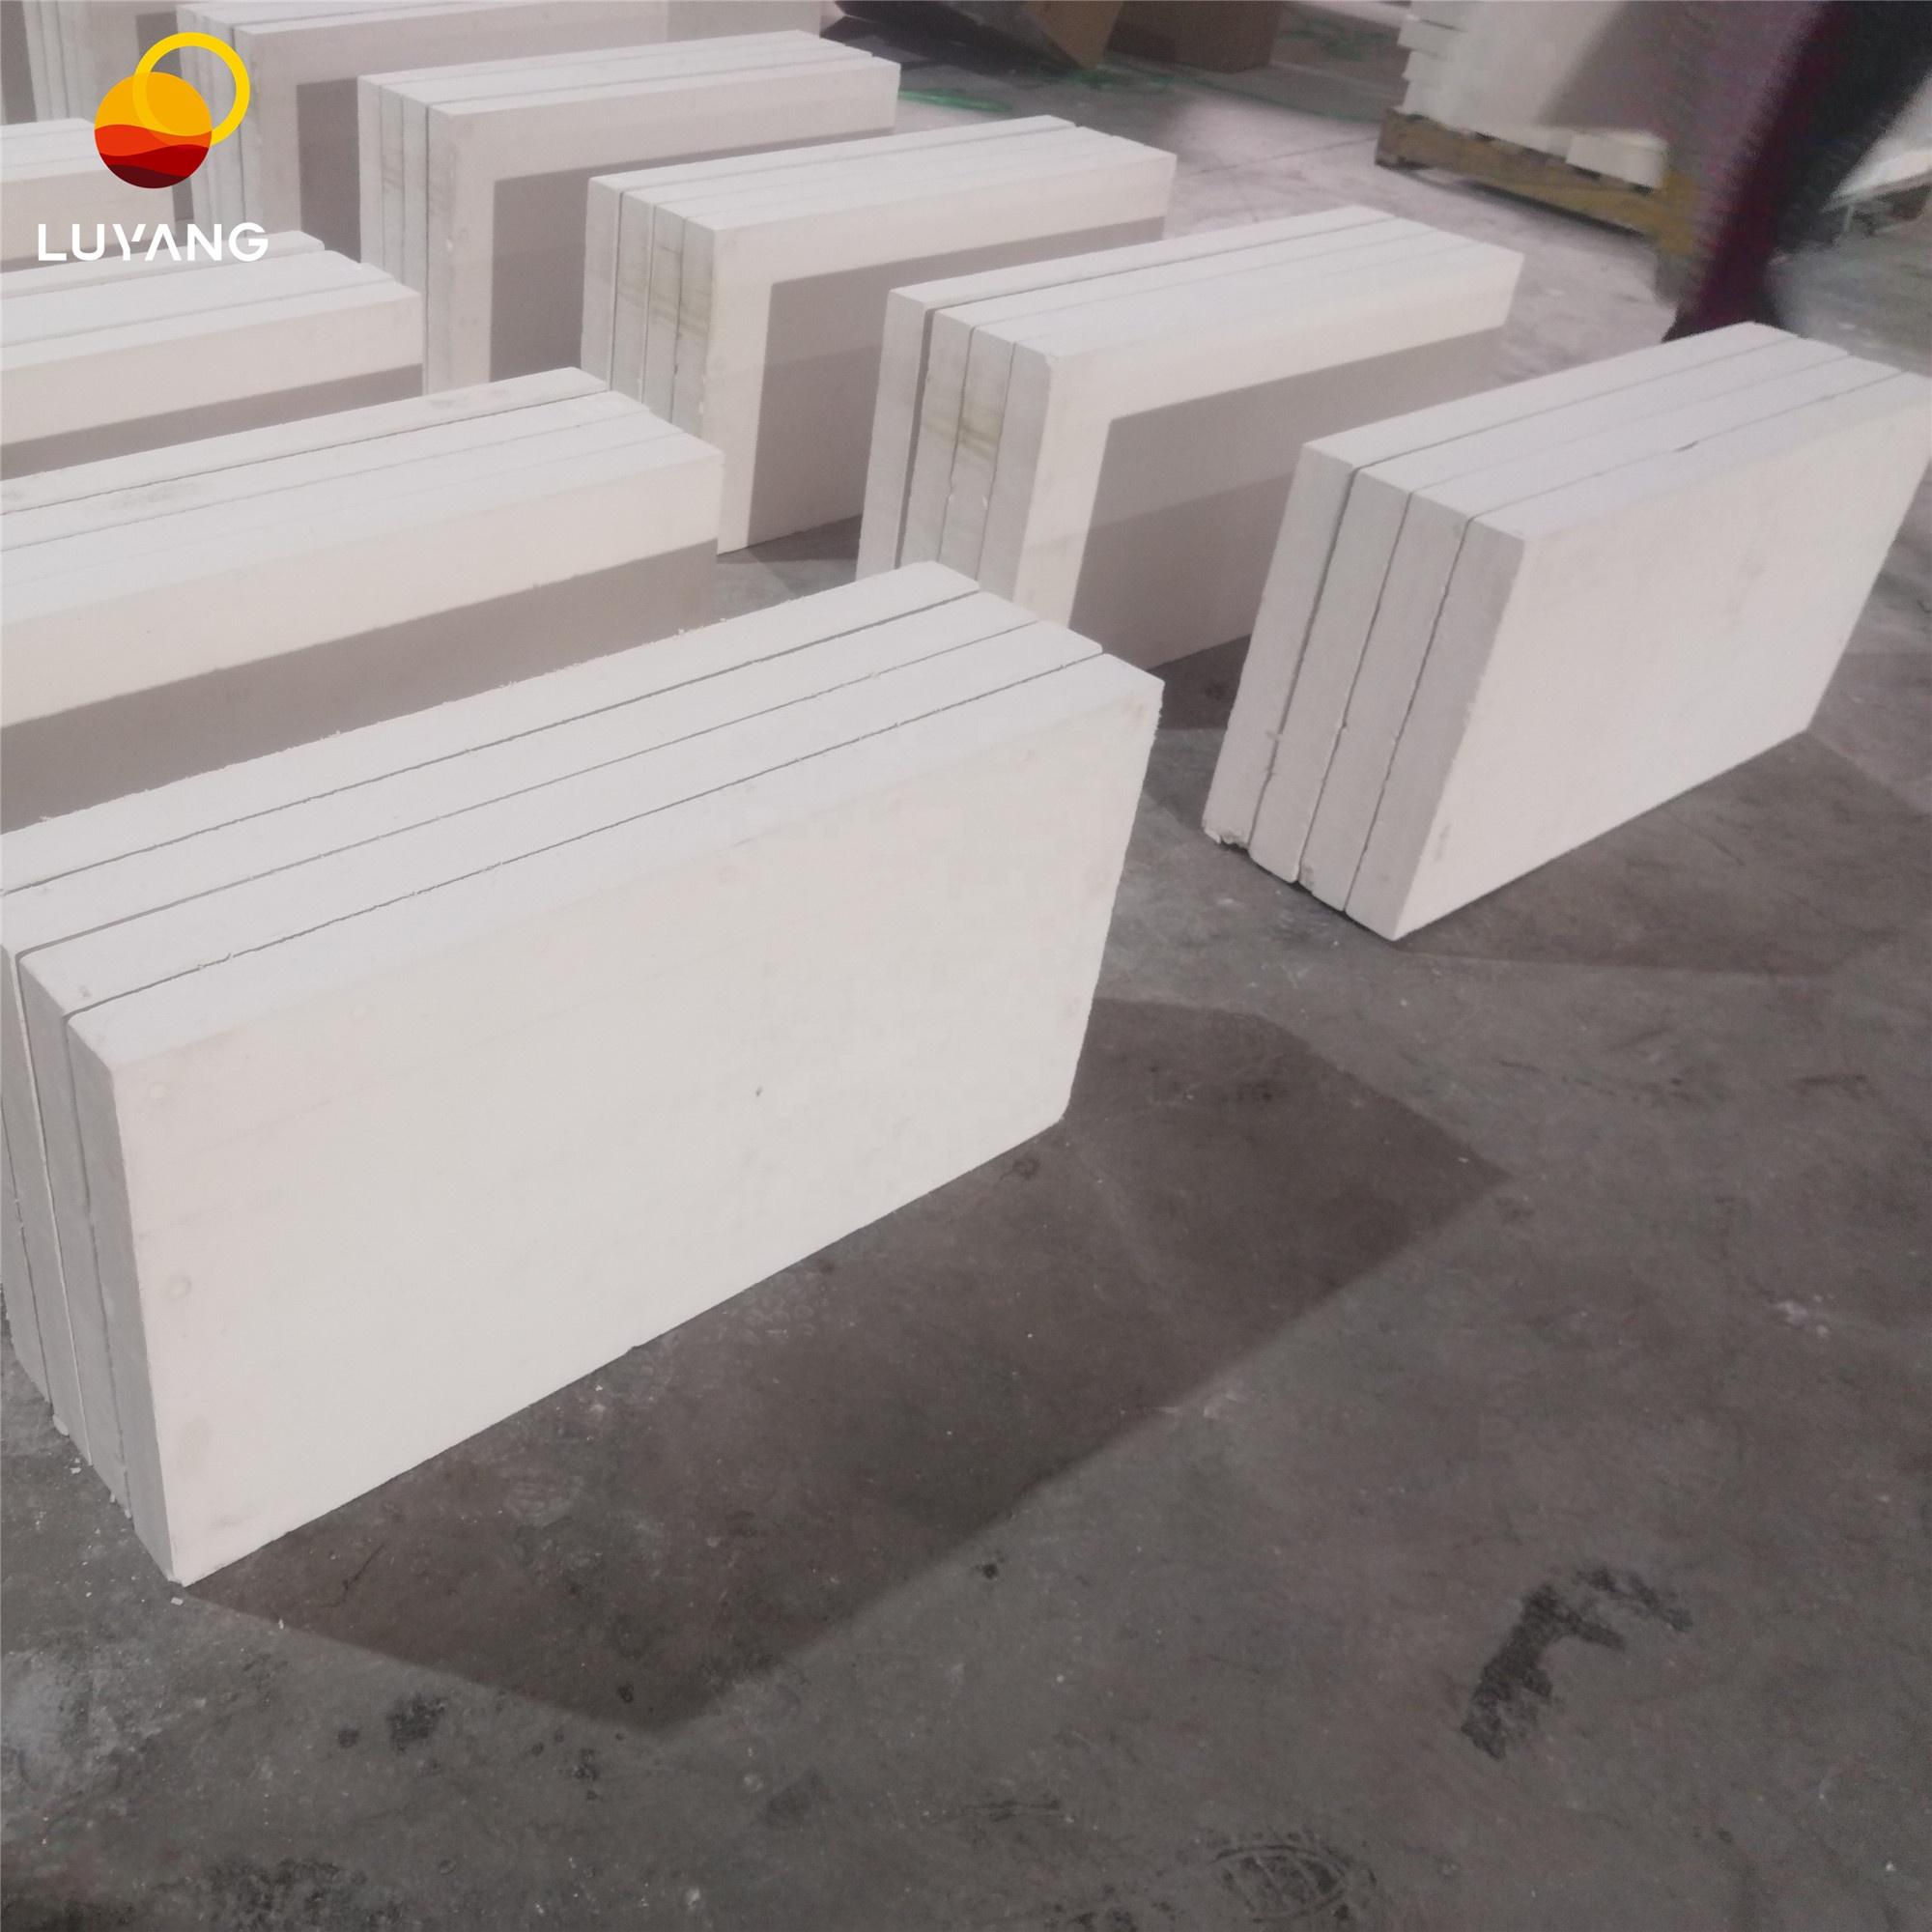 Кремниевая плита LUYANG 600x300x25 мм 220 кг/м3, теплоизоляция 650C, Кремниевая плита для промышленных печей